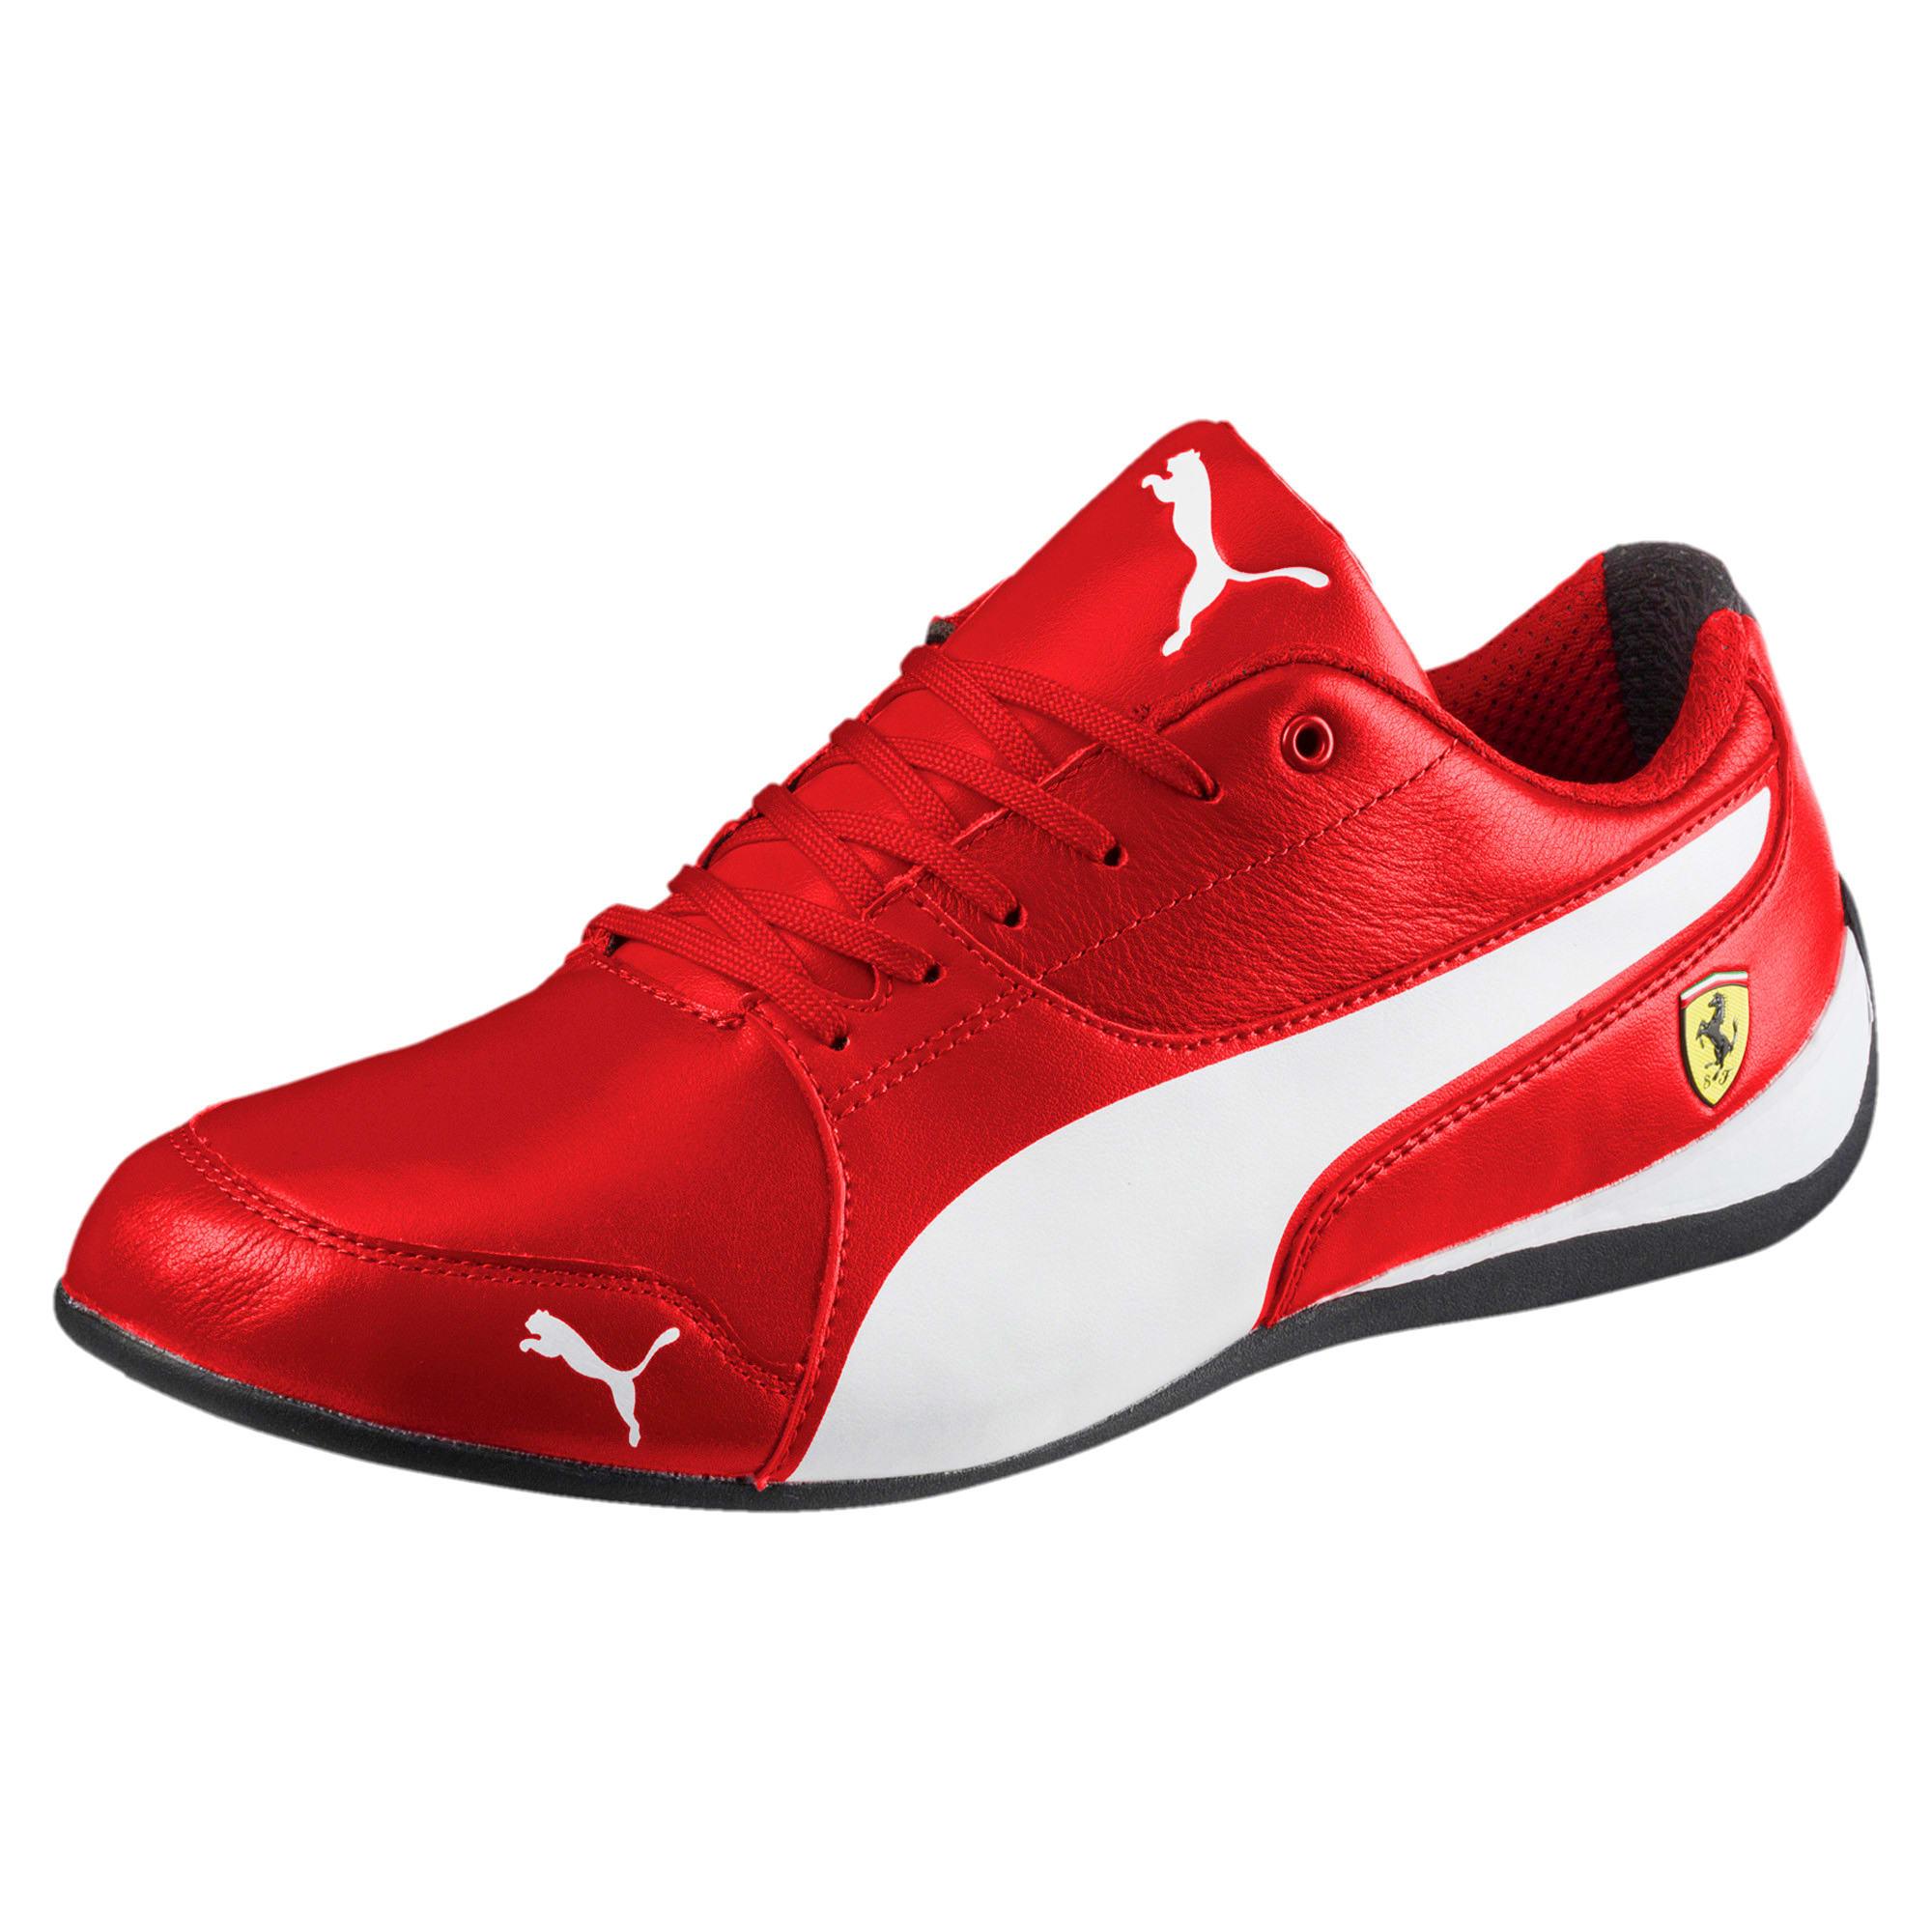 Thumbnail 1 of Scuderia Ferrari Drift Cat 7 Shoes, Rosso Corsa-Puma White-Black, medium